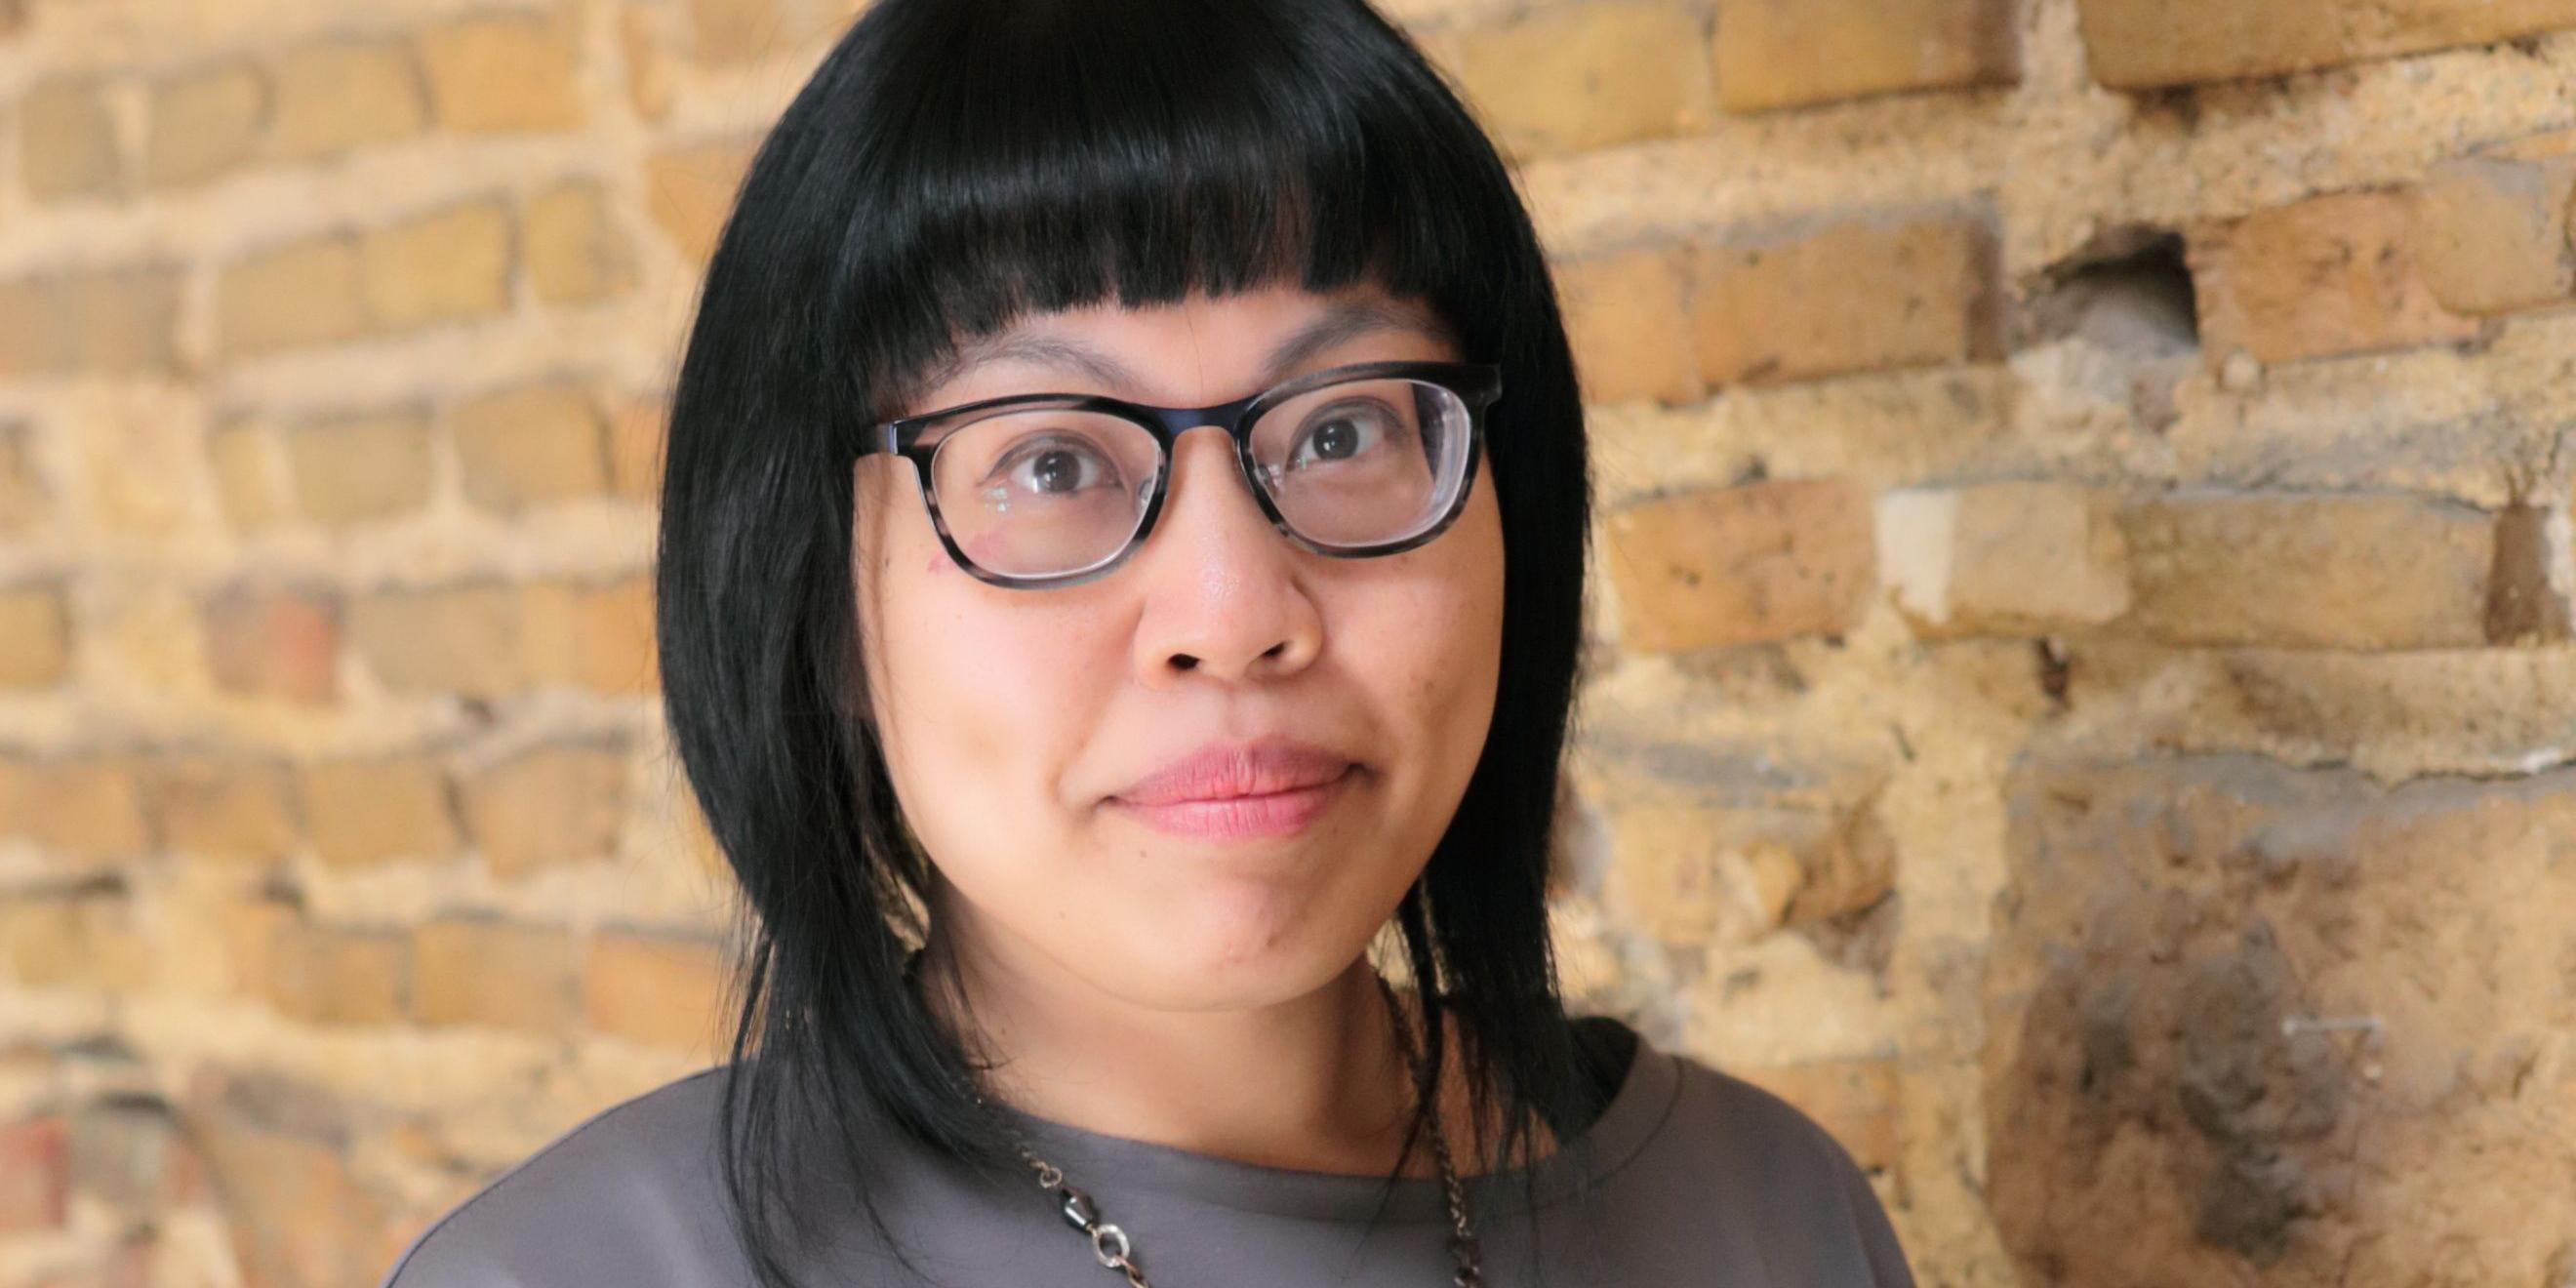 Melanie Yugo Canada, participant in the GCLP 2017 edition